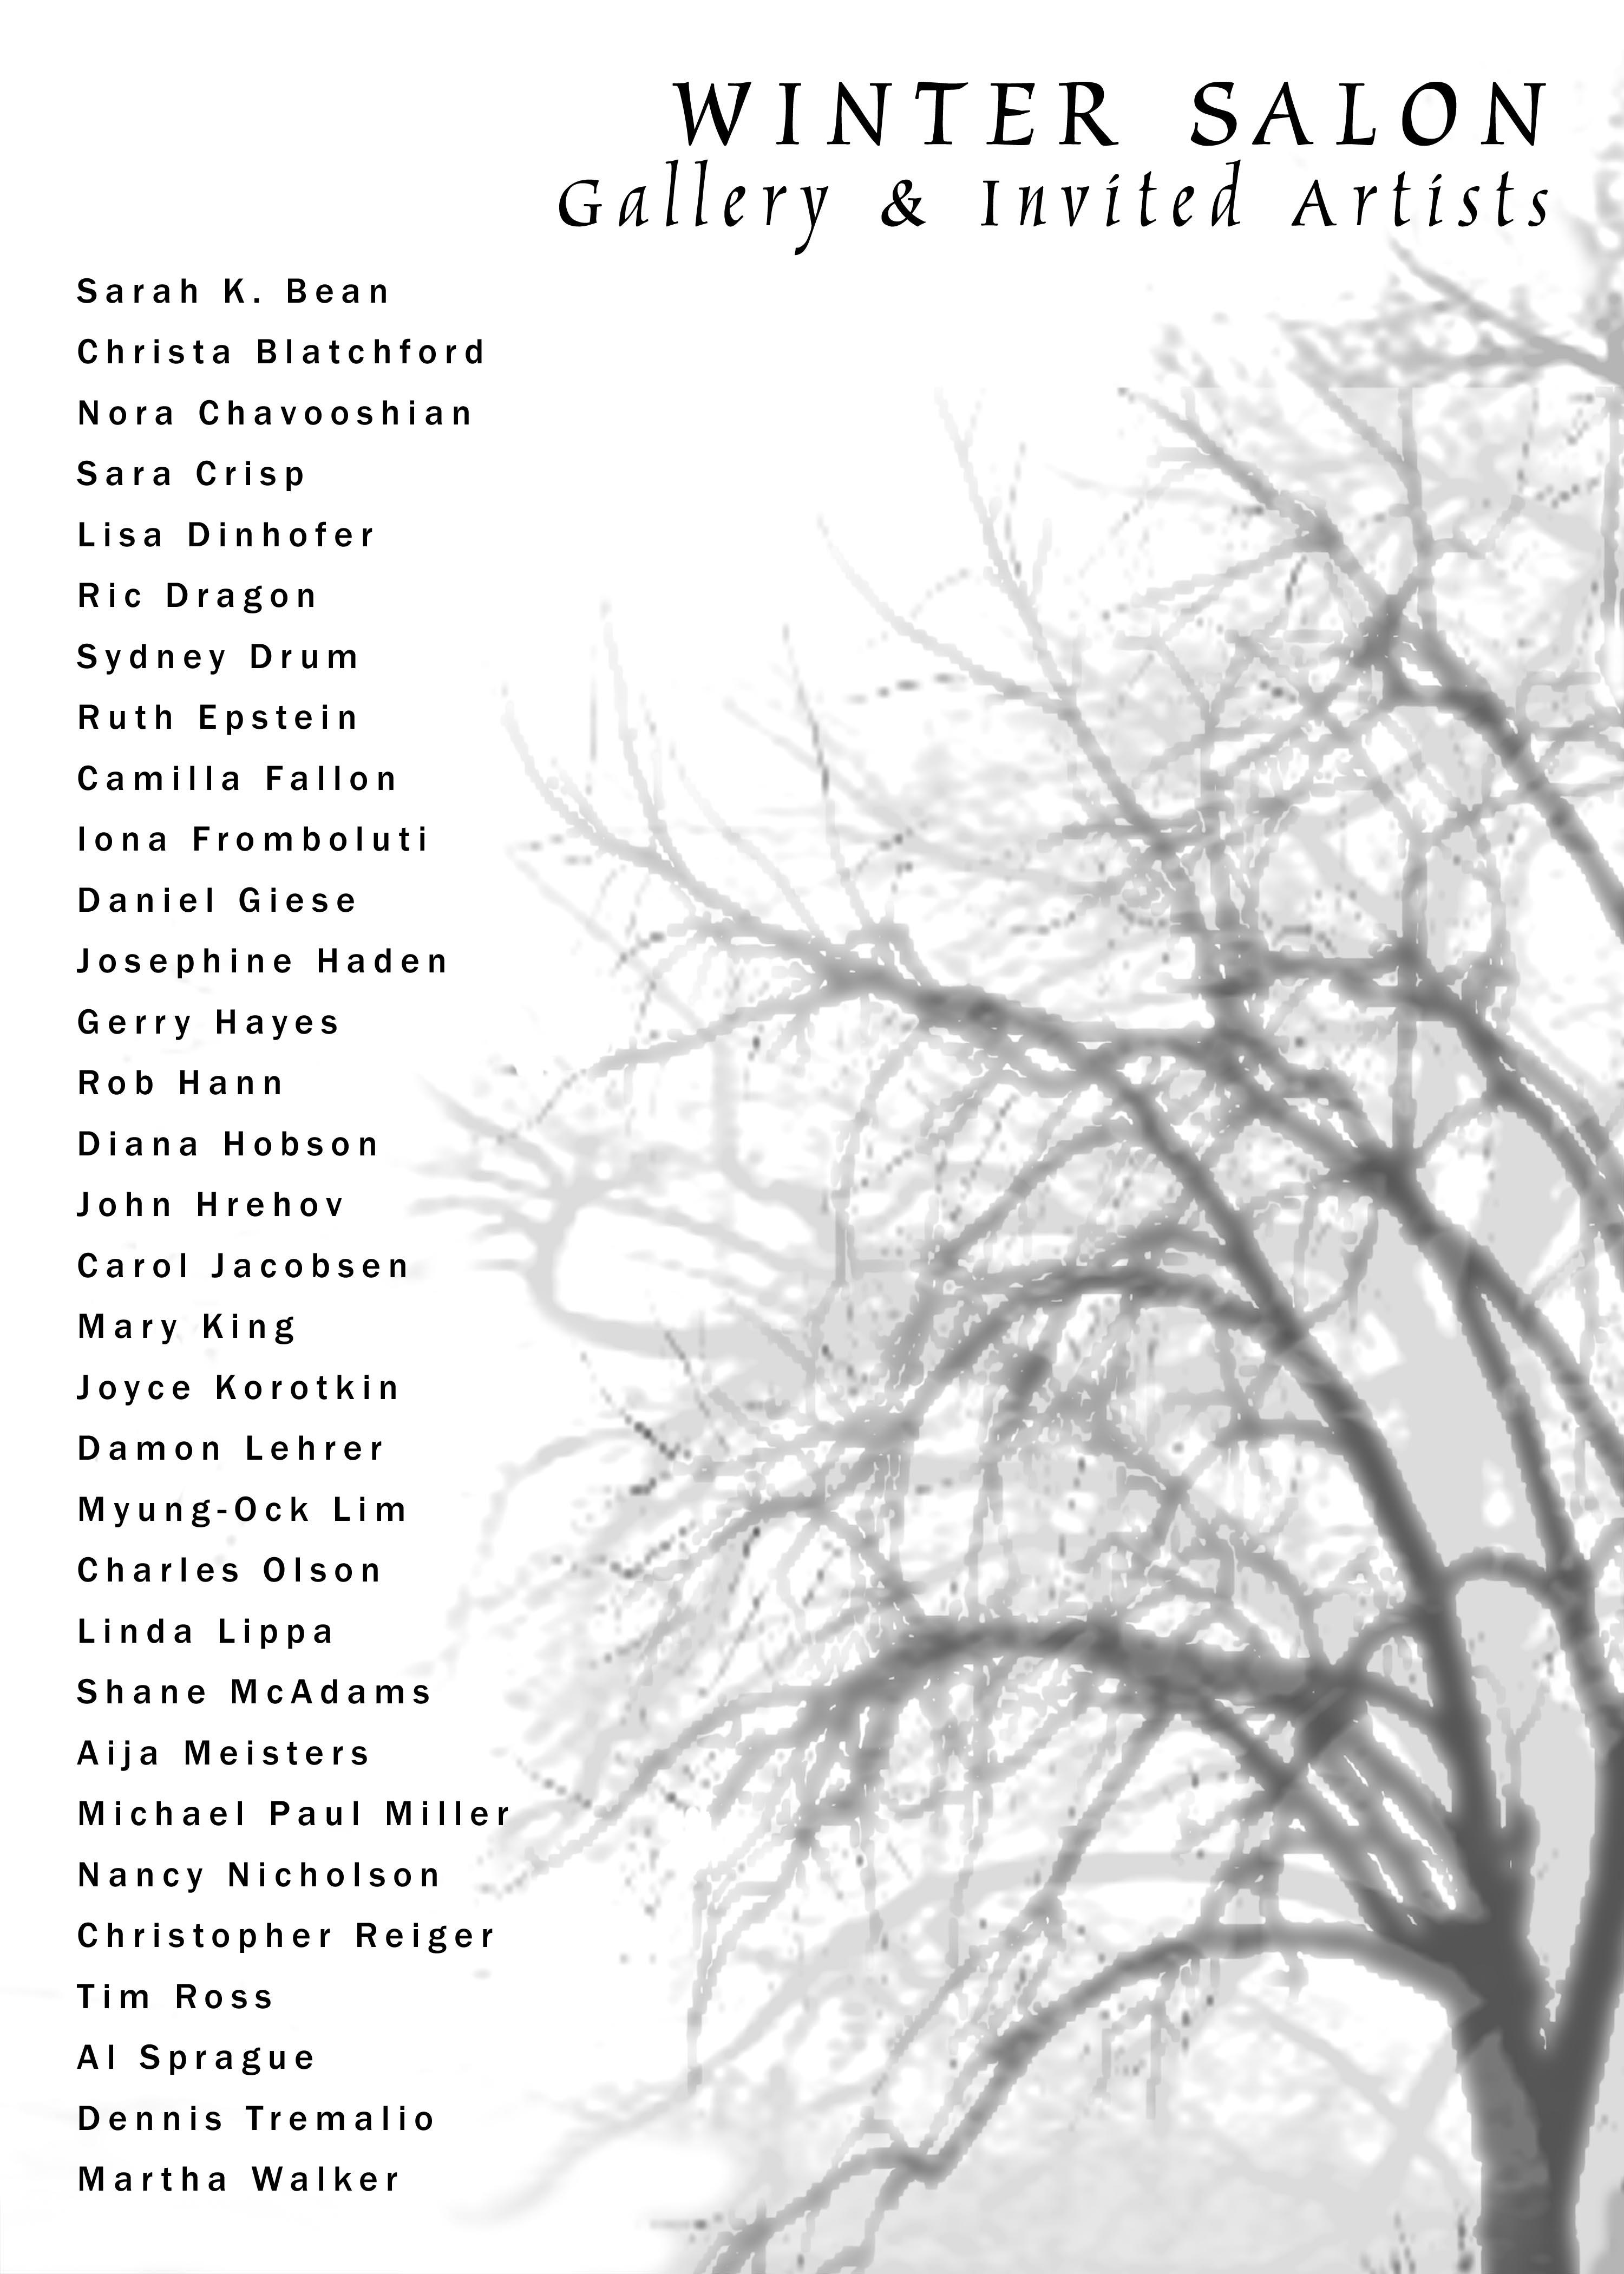 Winter Salon: Gallery & Invited Artists